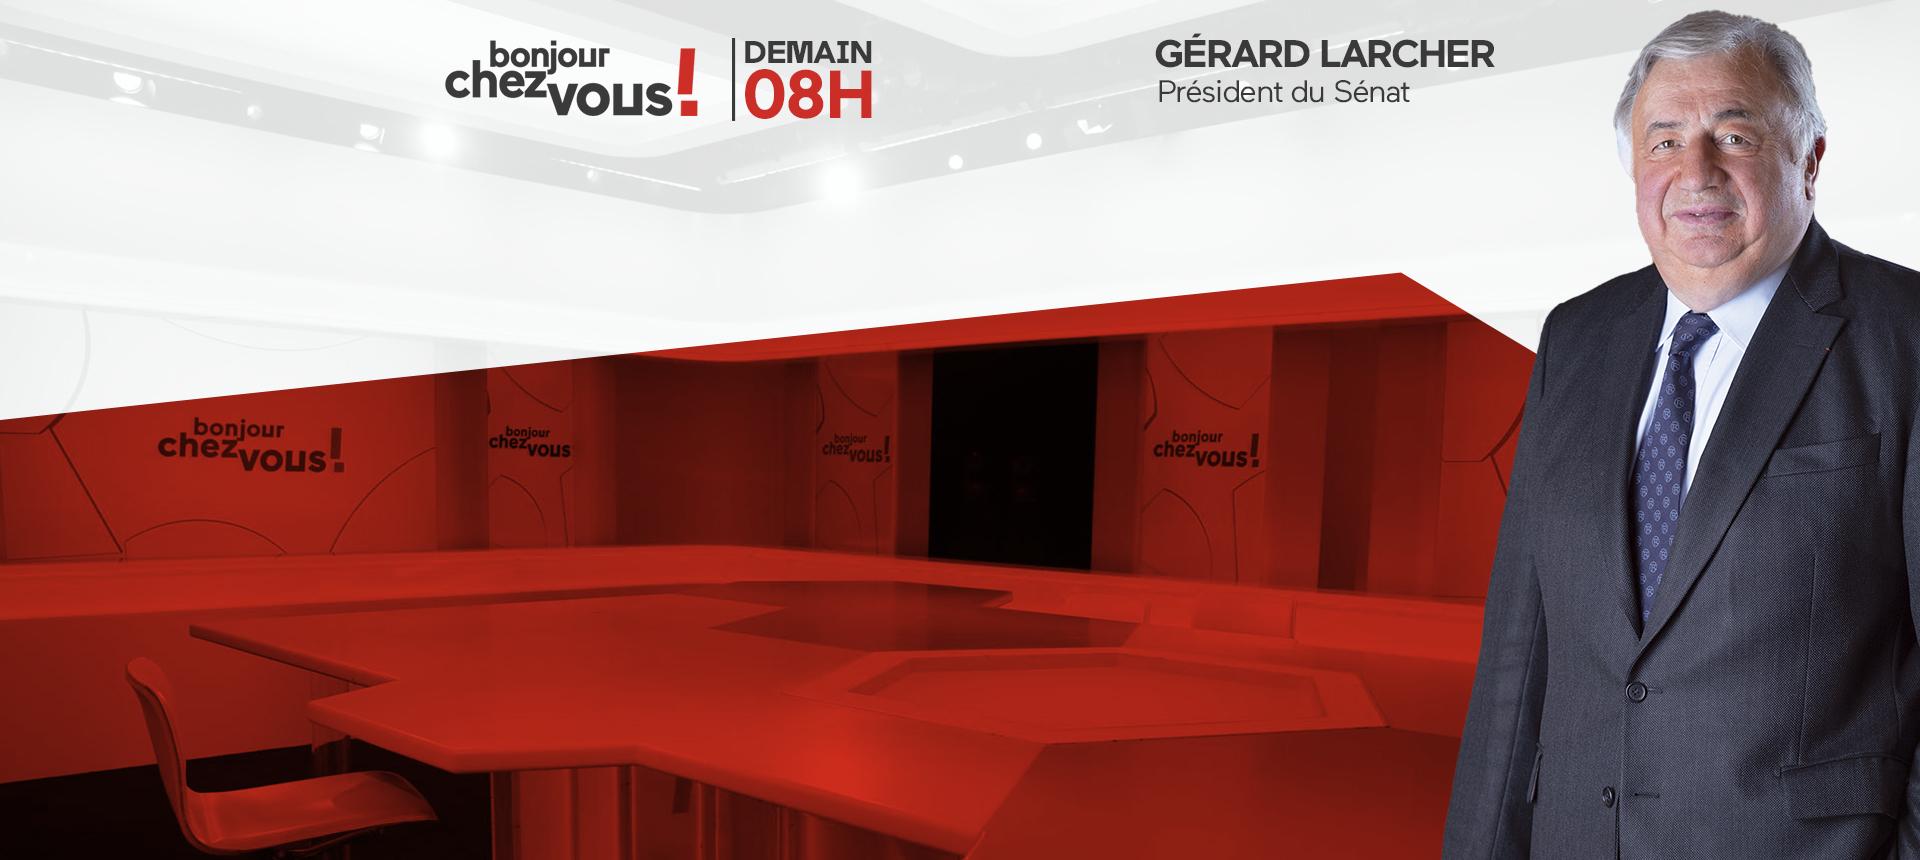 Gerard Larcher BCV 12/12 demain